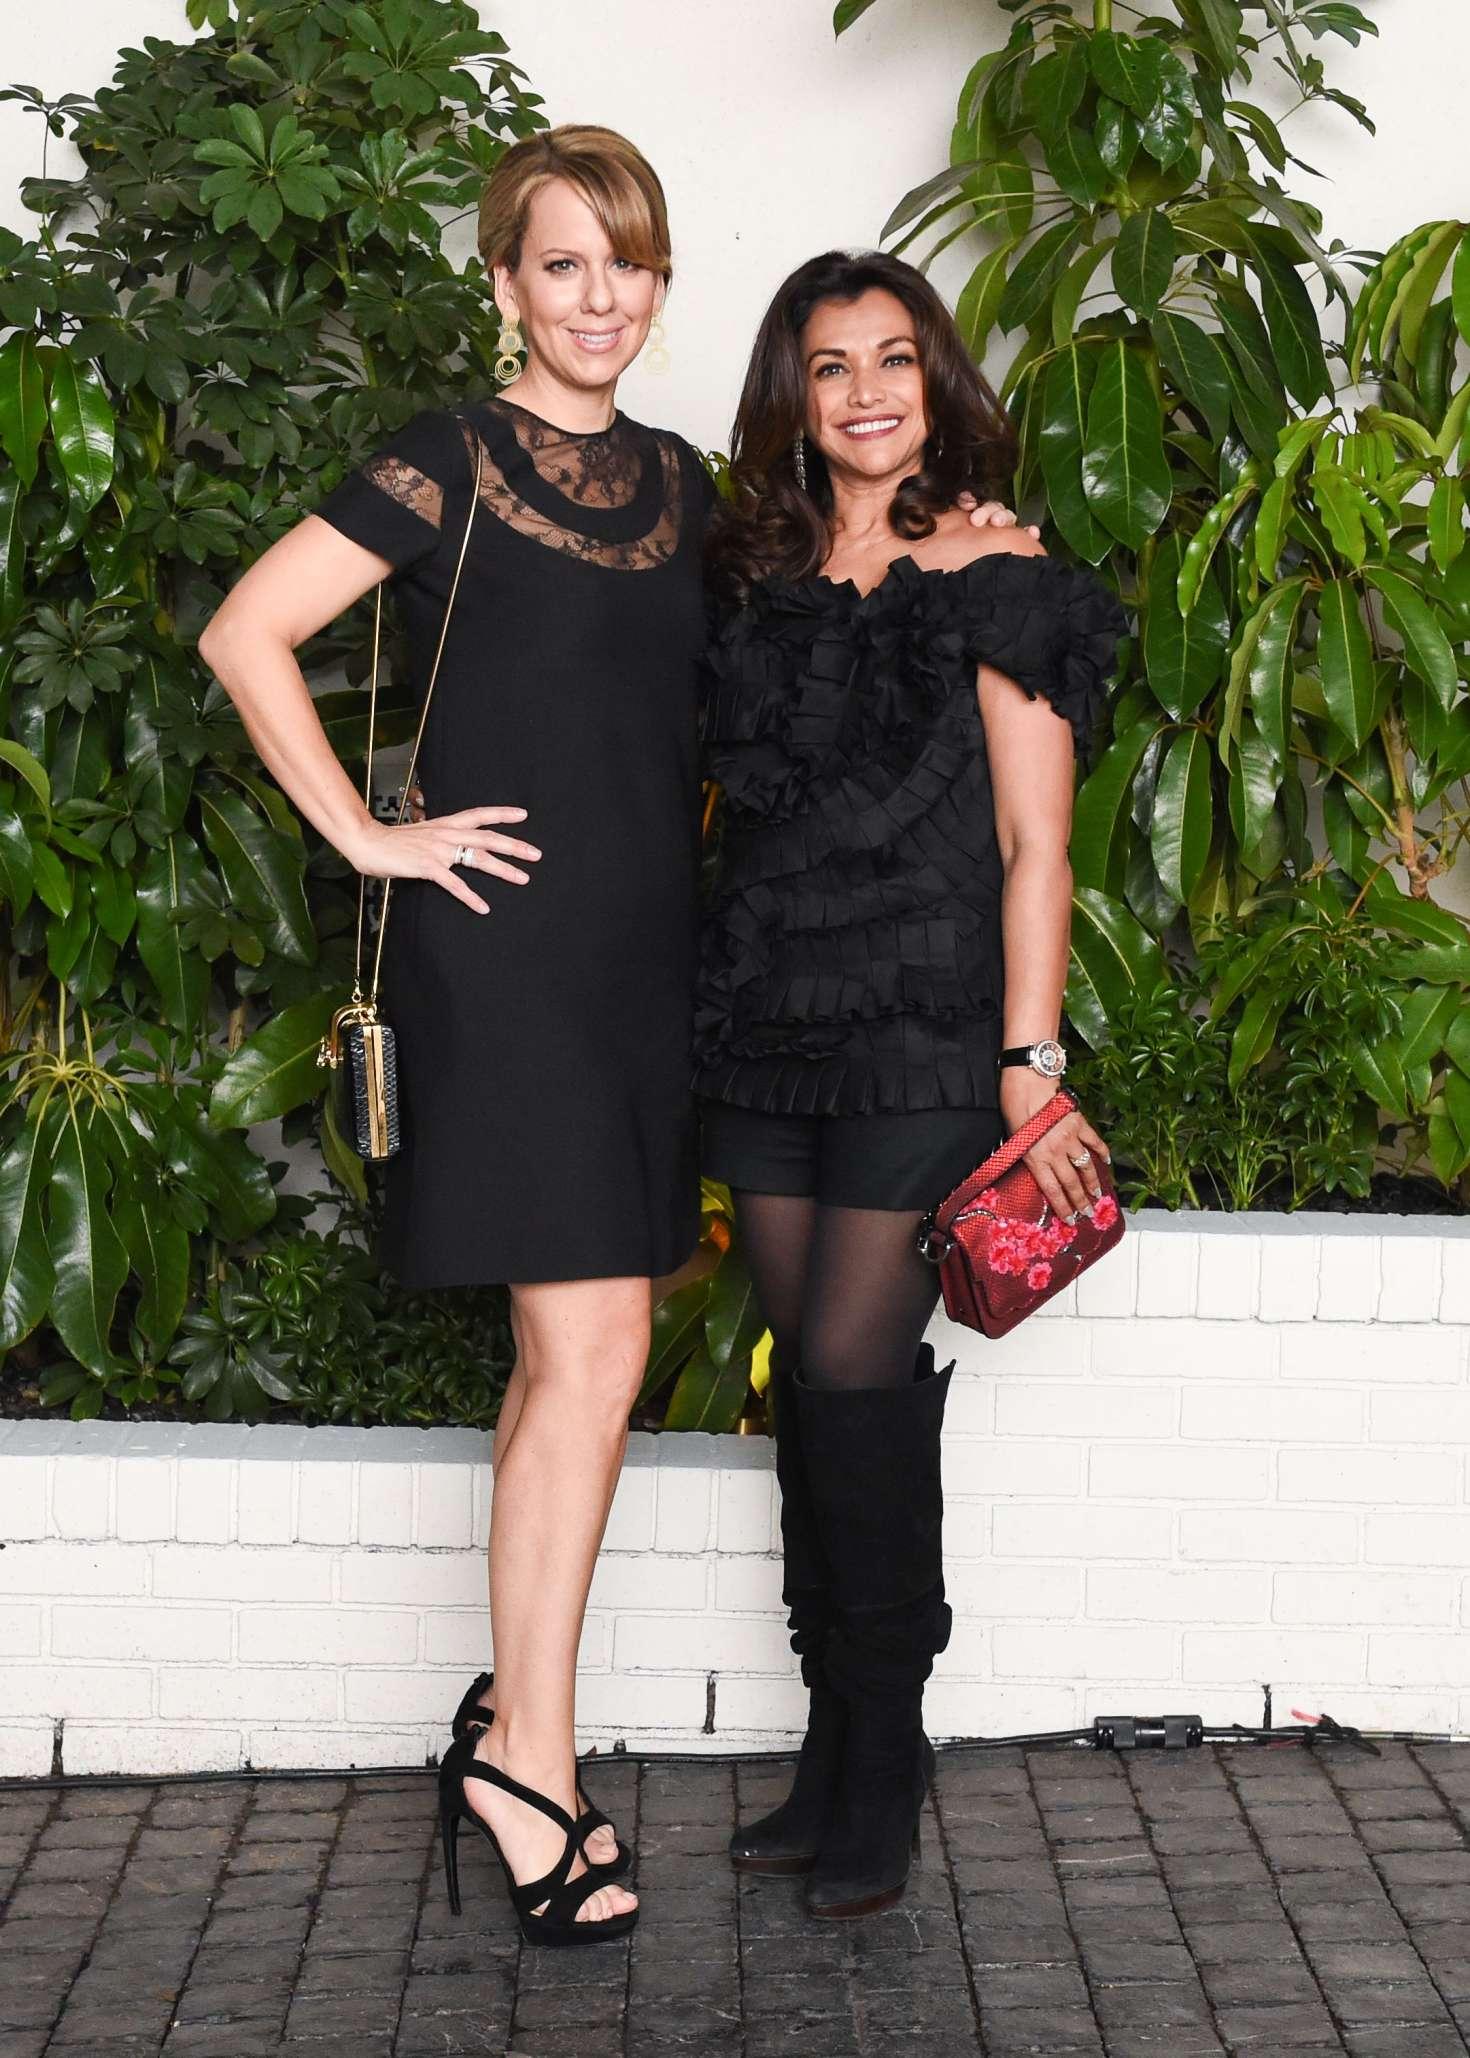 Lucy Kriz and Deborah Sawaf - W Magazine Celebrates Best Performances Portfolio & Golden Globes in LA